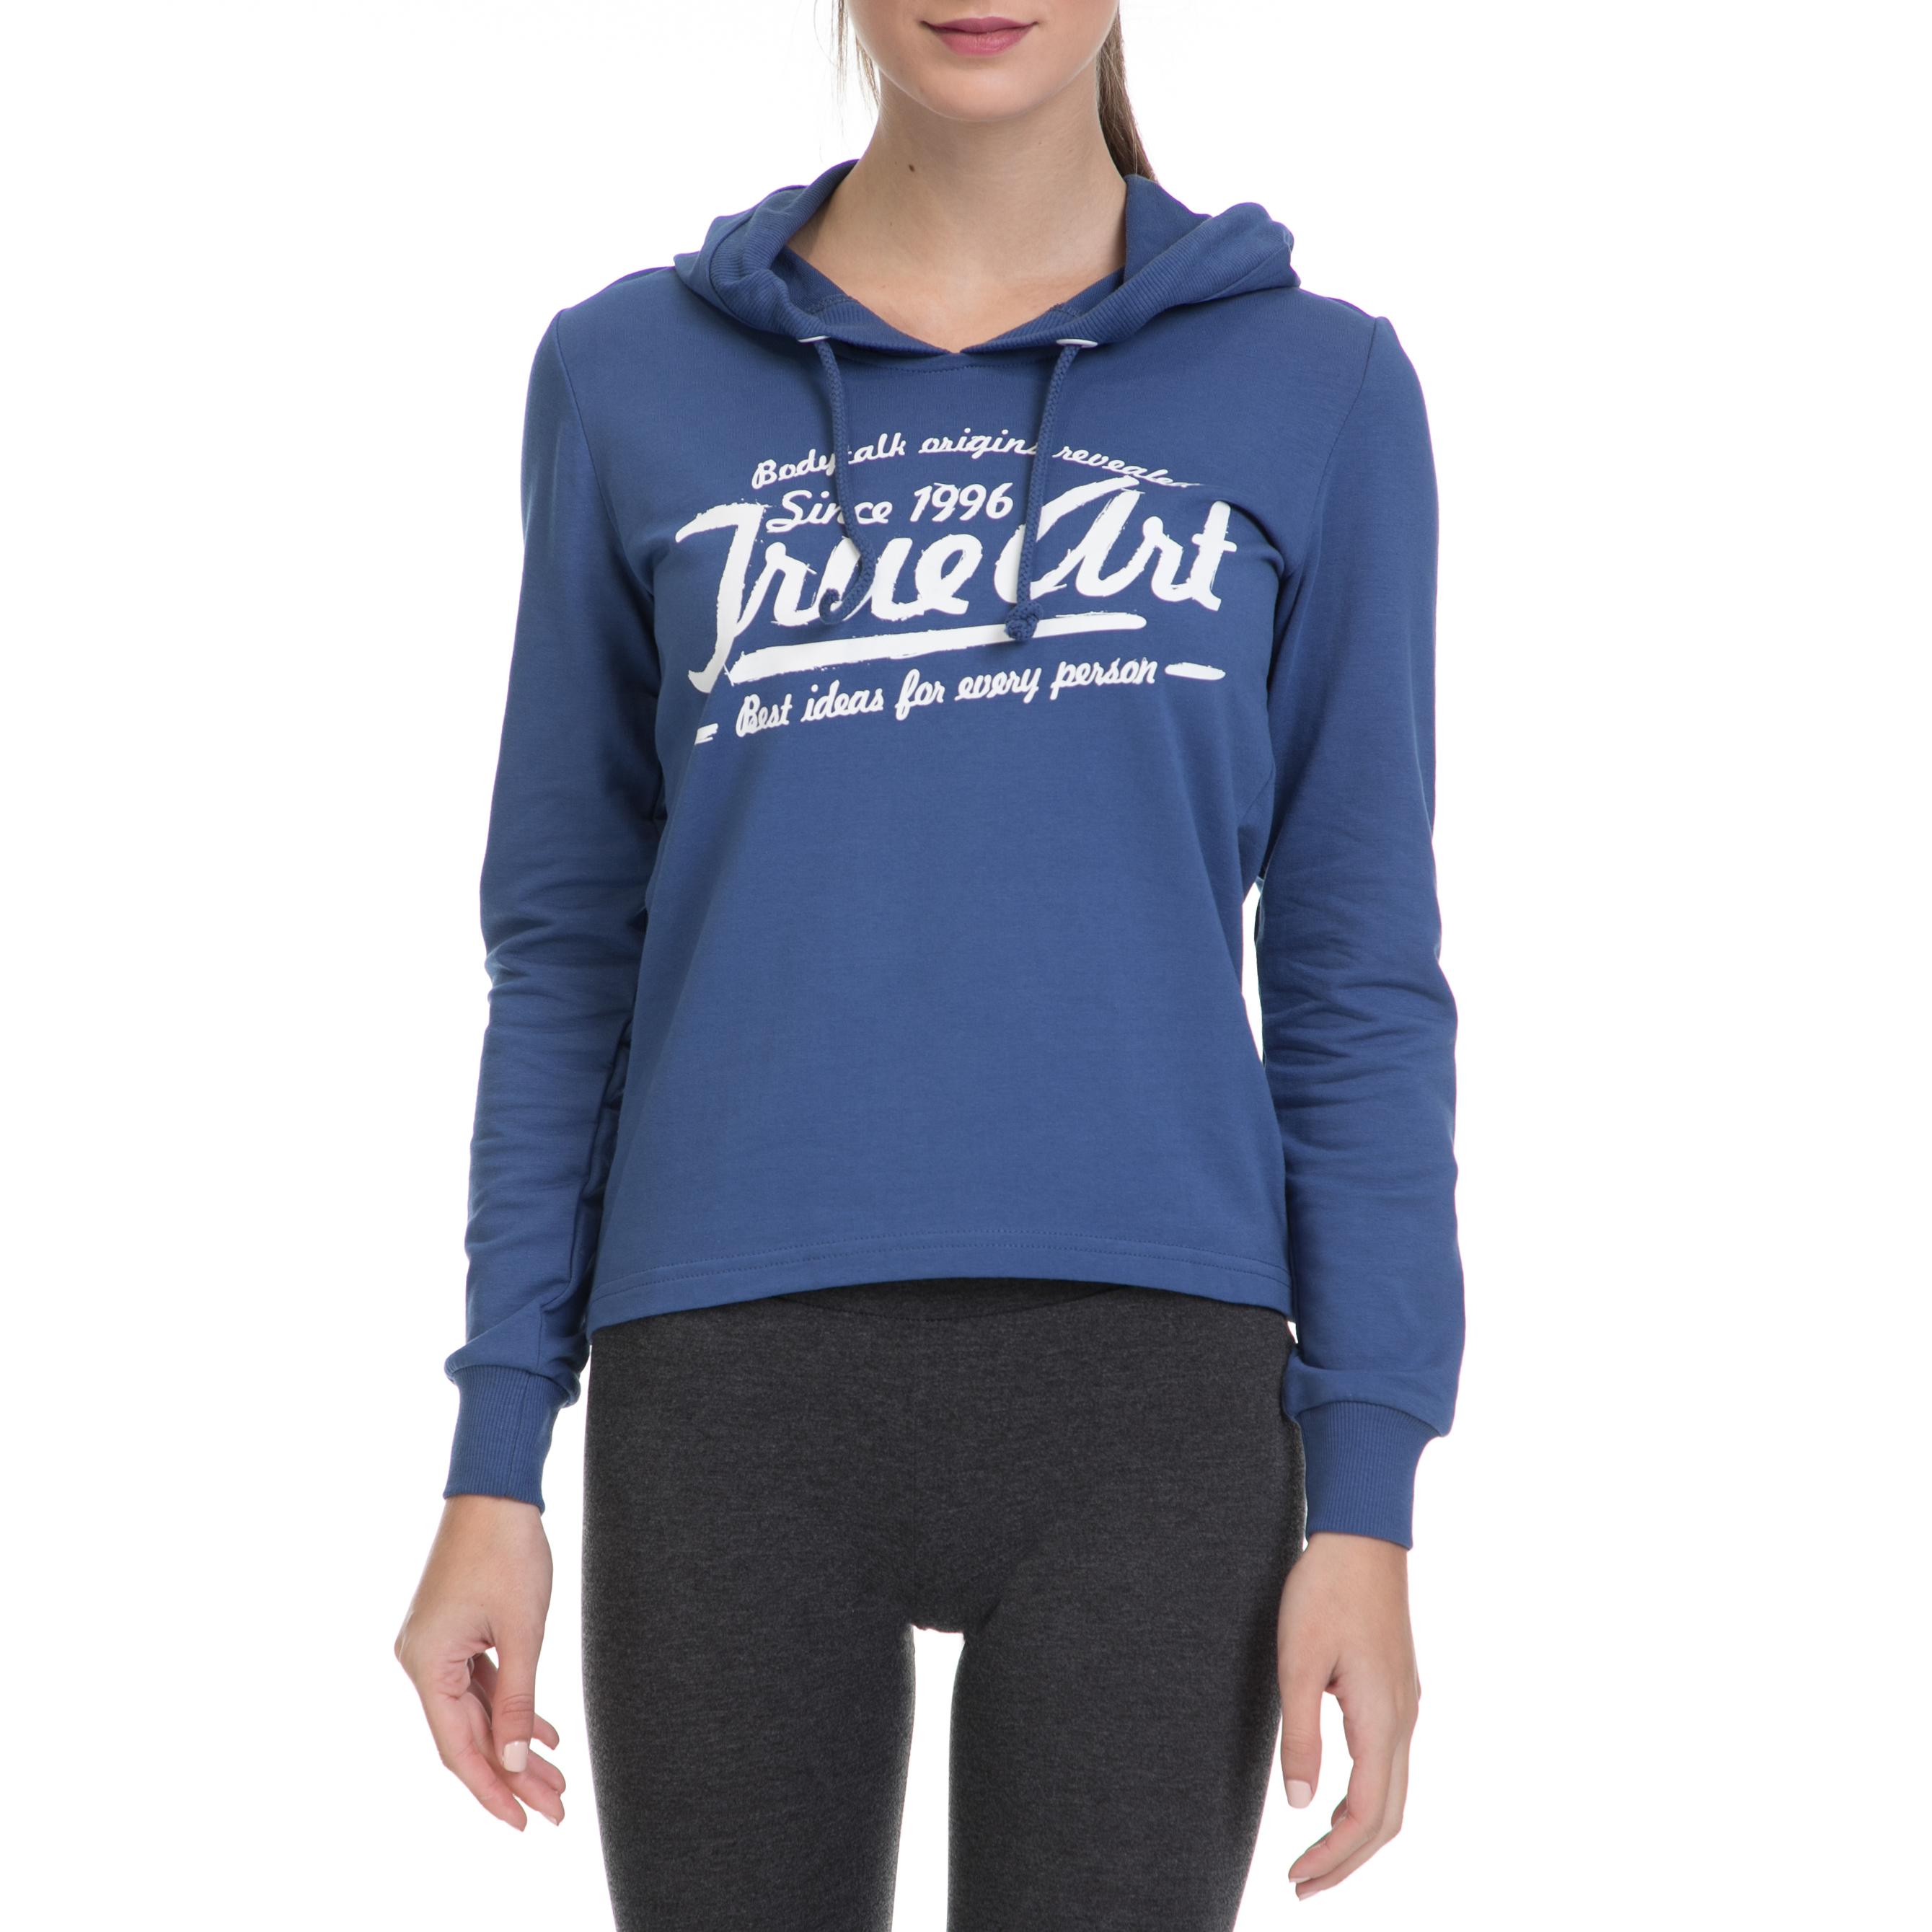 BODYTALK - Γυναικεία αθλητική μπλούζα ARTW BODYTALK μπλε γυναικεία ρούχα αθλητικά φούτερ μακρυμάνικα